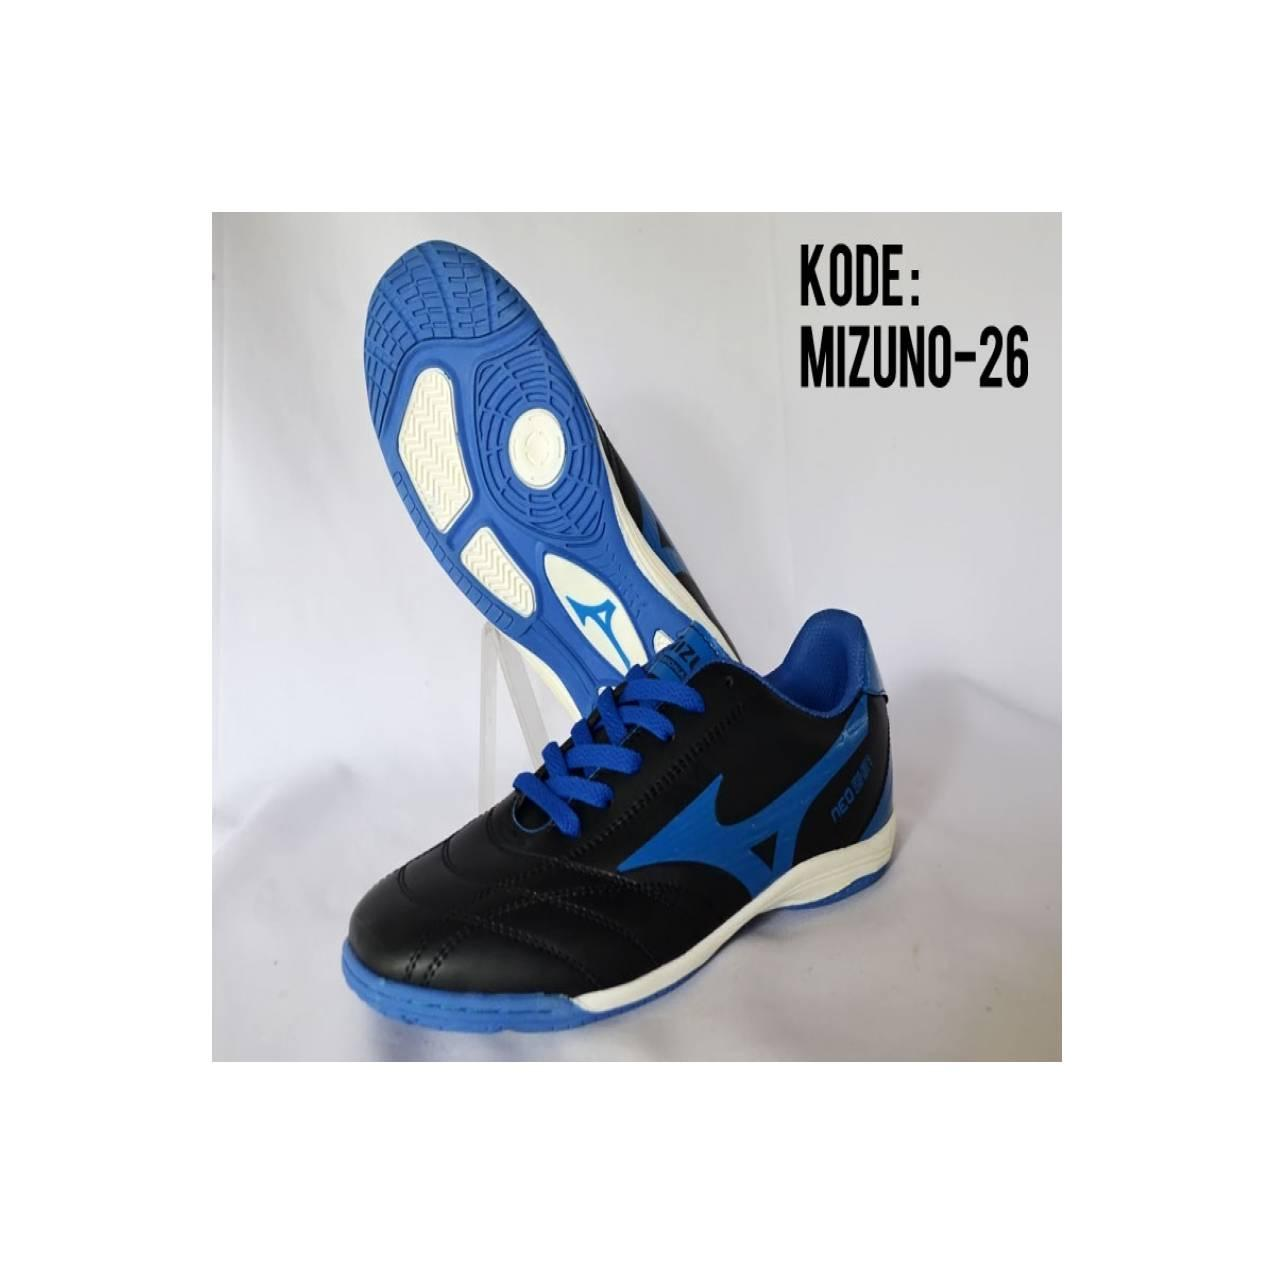 Sepatu Futsal Mizuno KW 1 Kode Mizuno 26